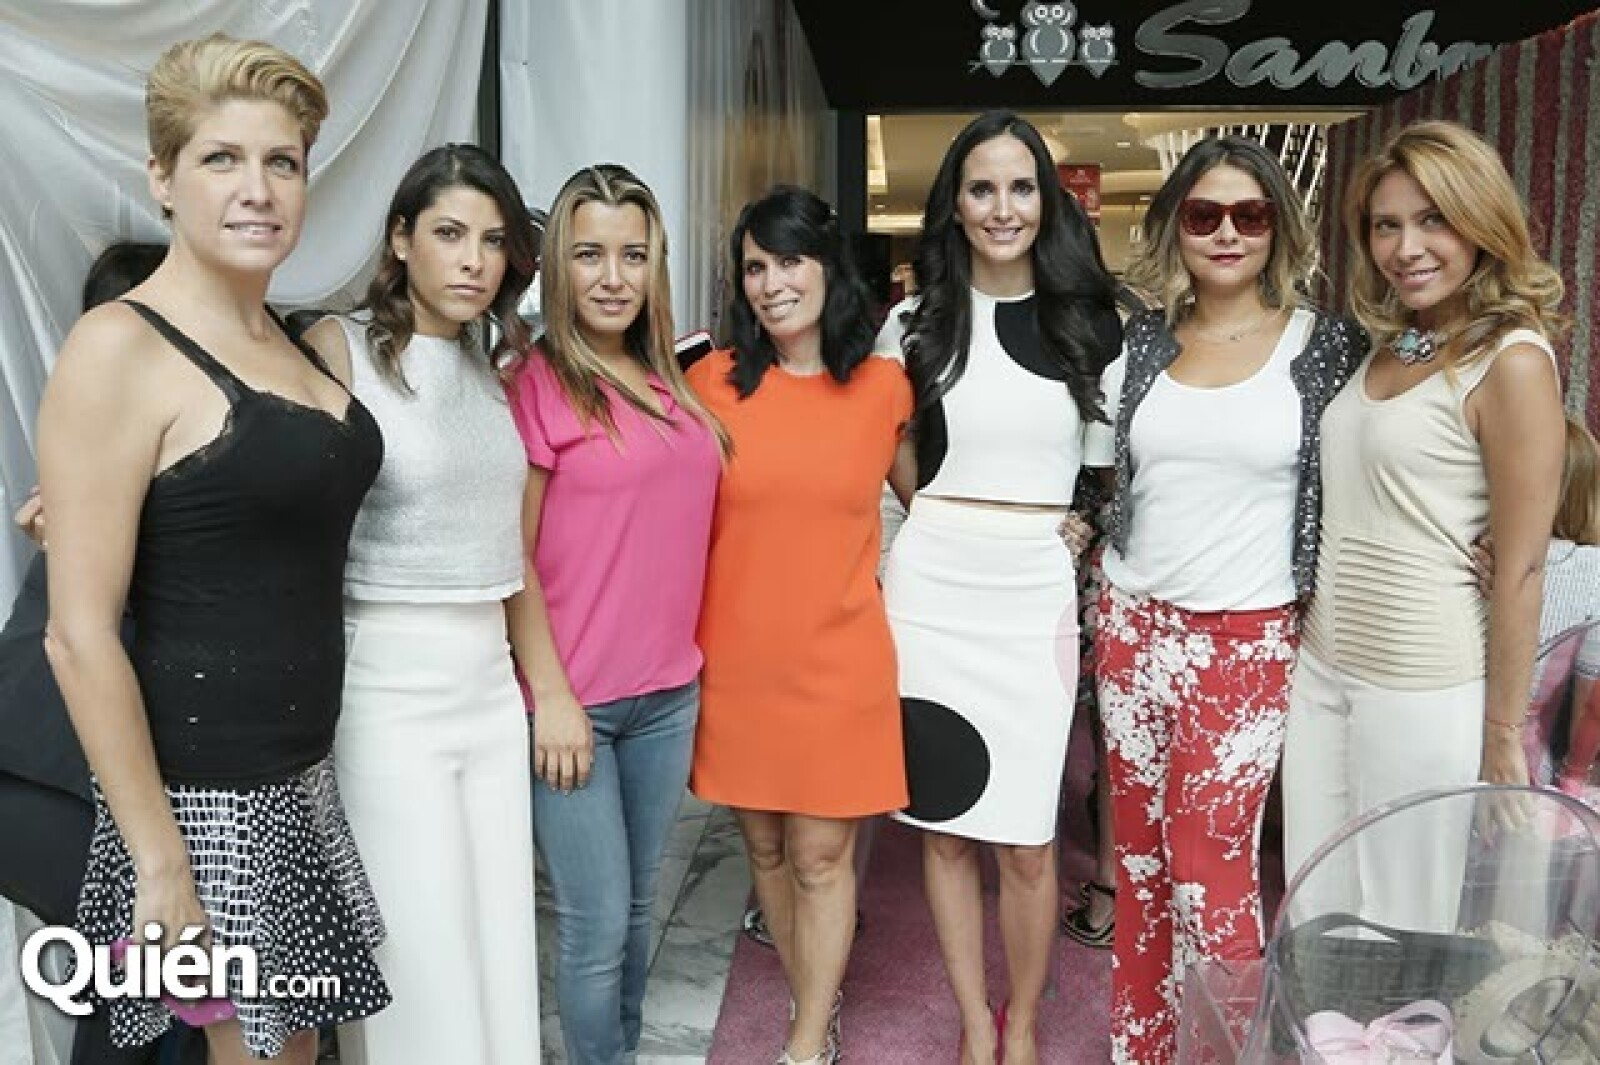 Paulina Díaz Ordaz,Sylvana Beltrones,Zsa Zsa JCorro,Claudia Reta,Valeria López,Alexia Camil y Jimena Gallego